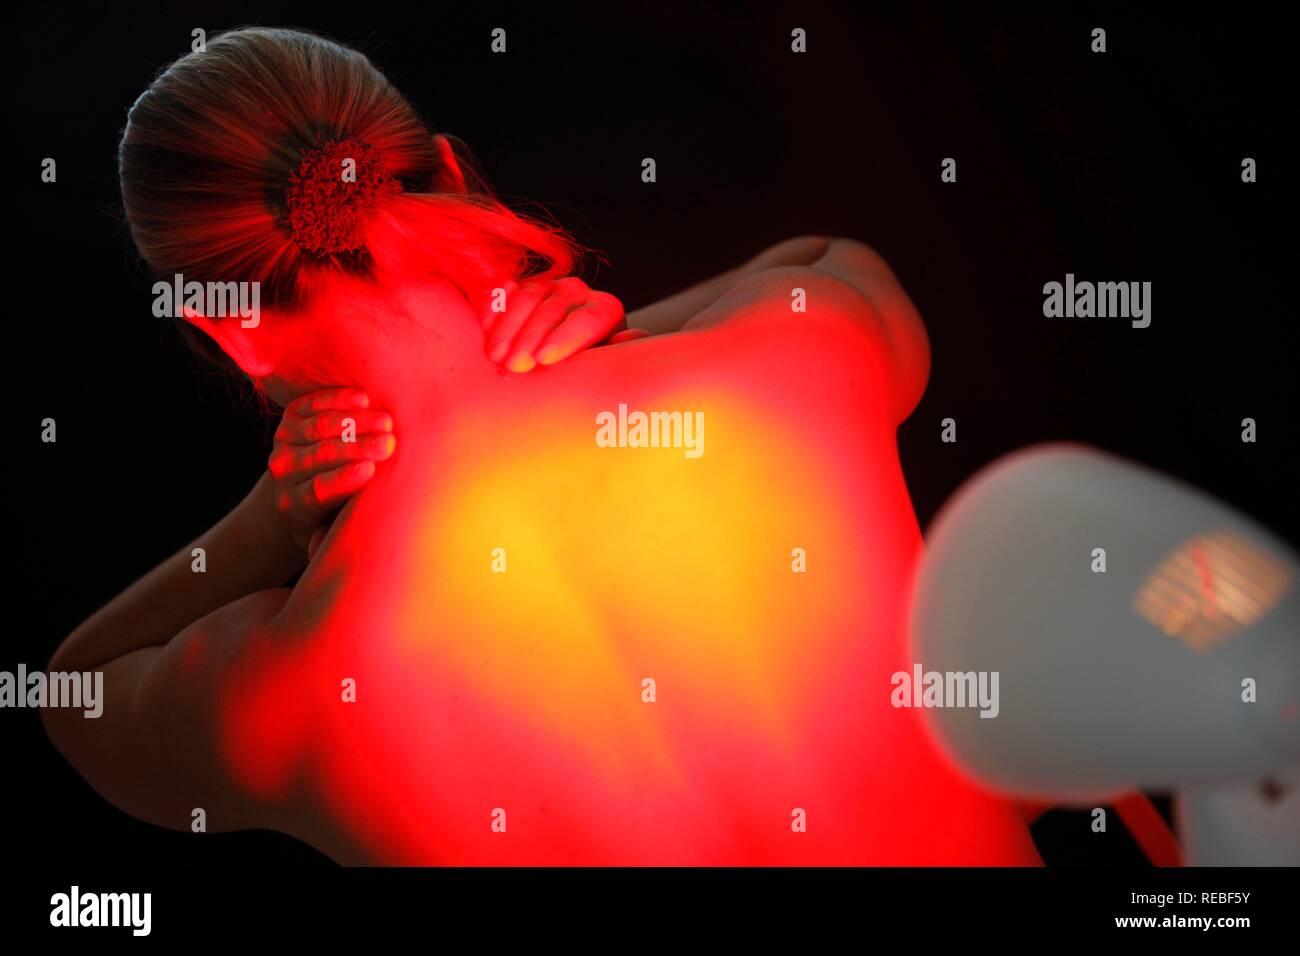 Therapie Stockfotosamp; Alamy Bilder Licht Uv ONm80wvn